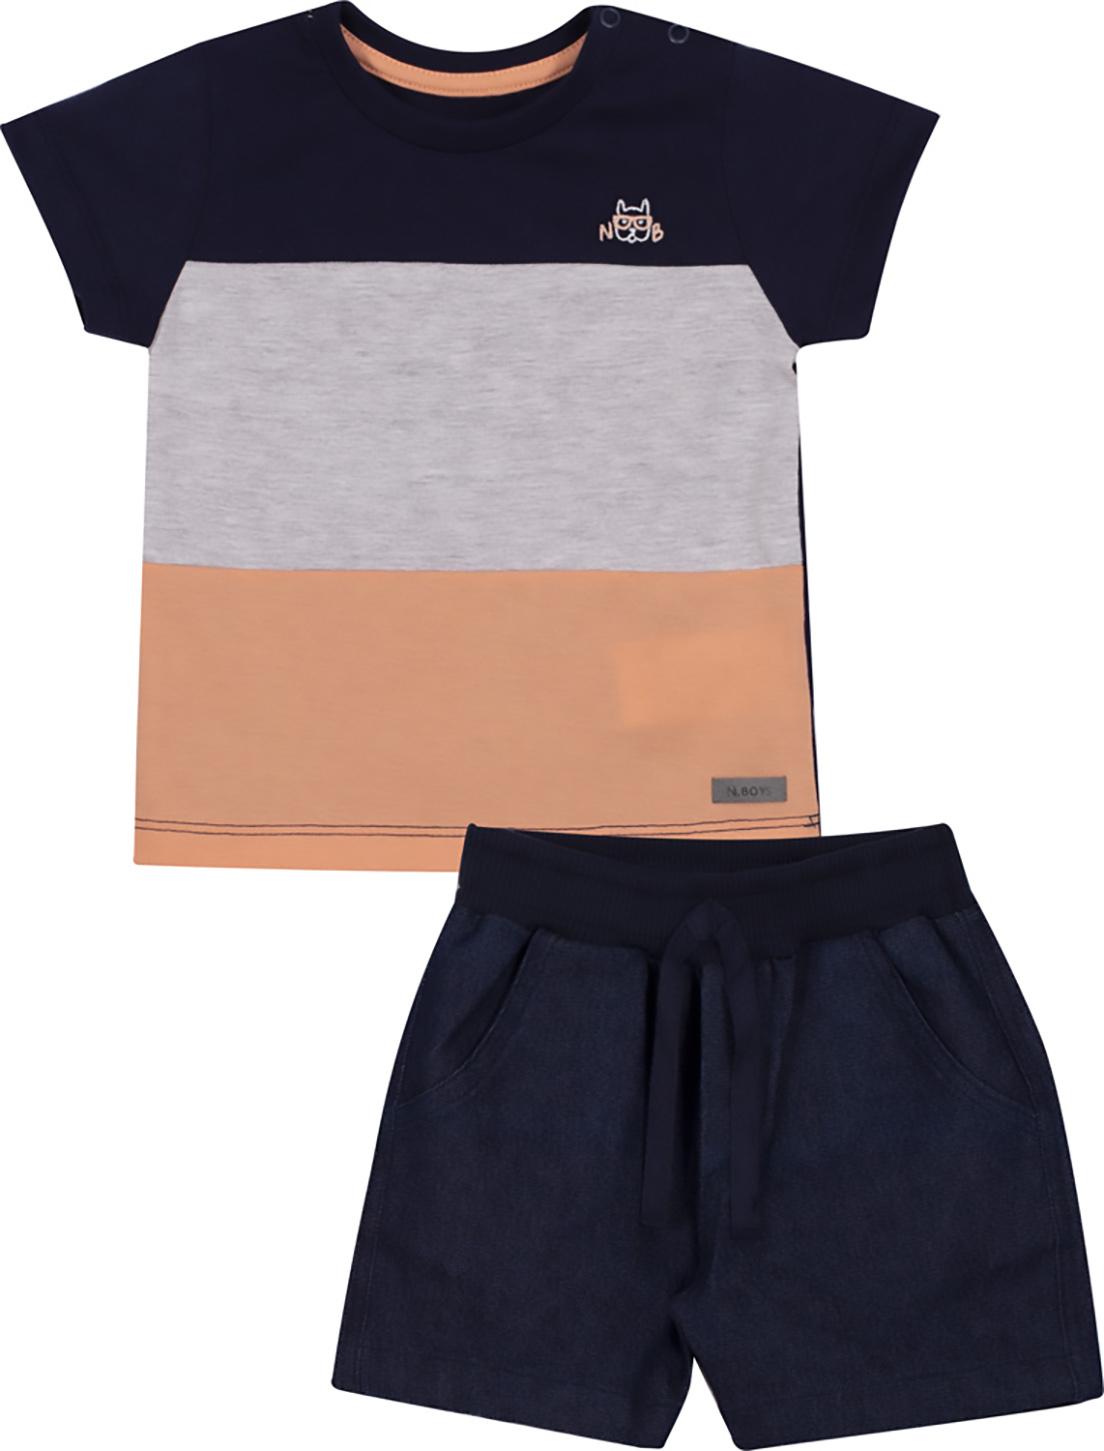 Conjunto Infantil Camiseta e Bermuda Jeans Nini&Bambini Marinho e Cinza